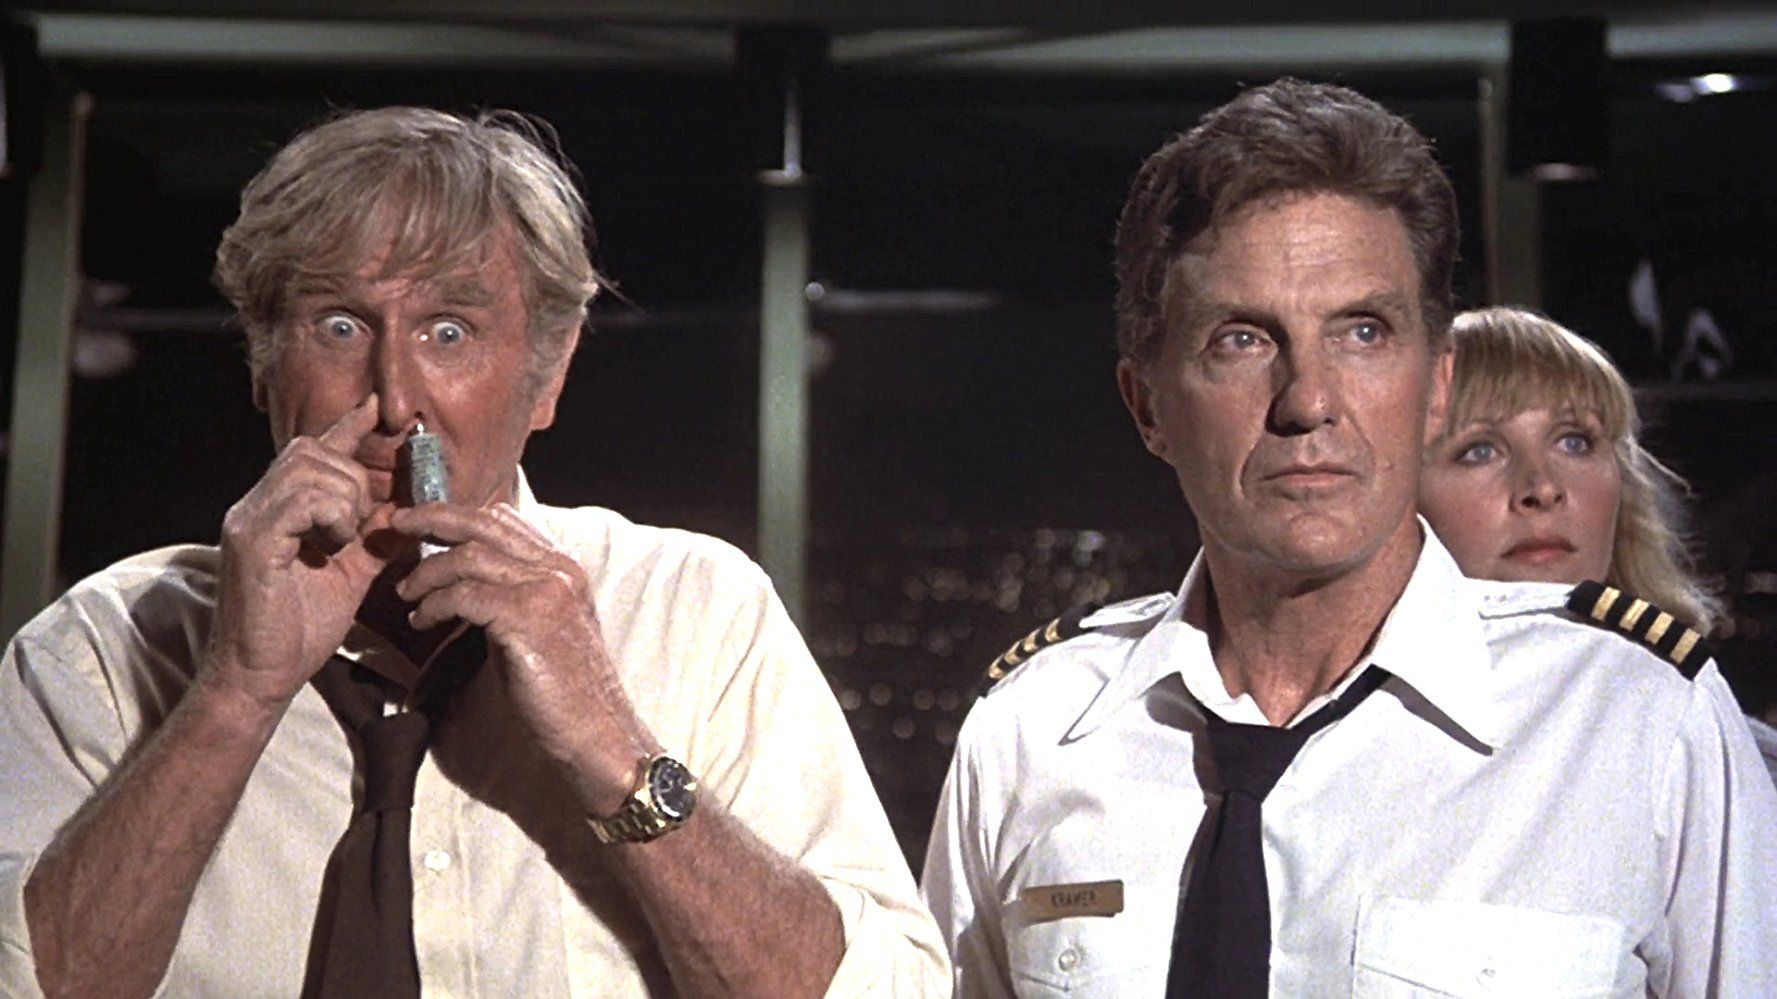 Lloyd Bridges, Robert Stack, and Lee Terri in Airplane